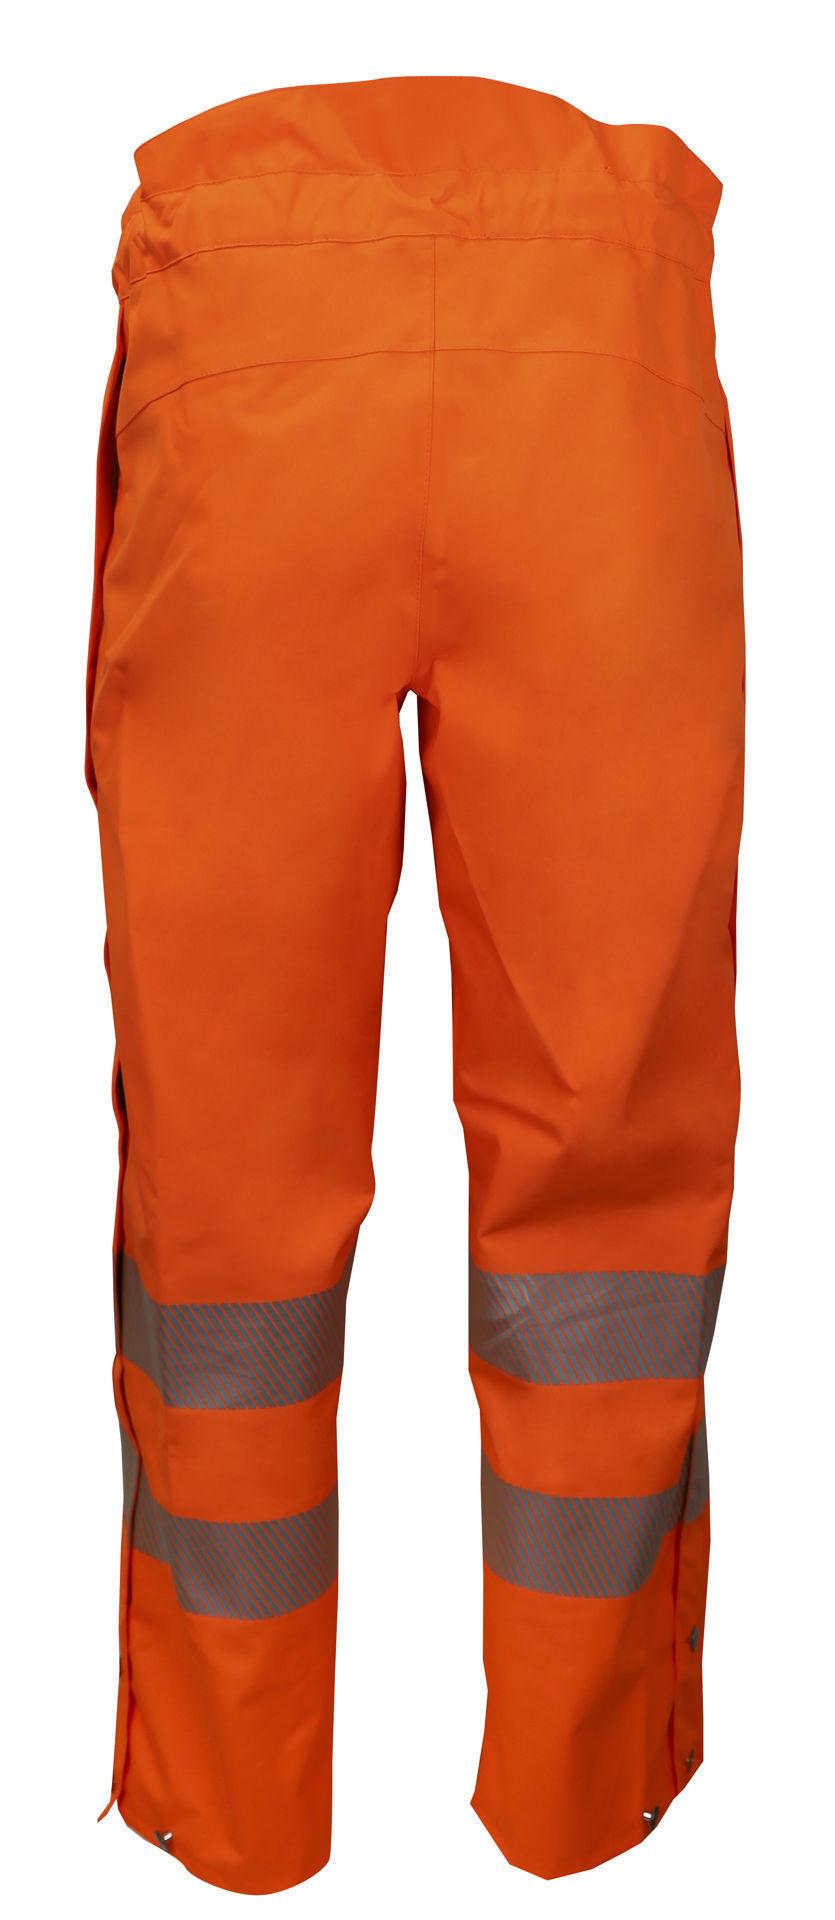 Uetlieberg_orange